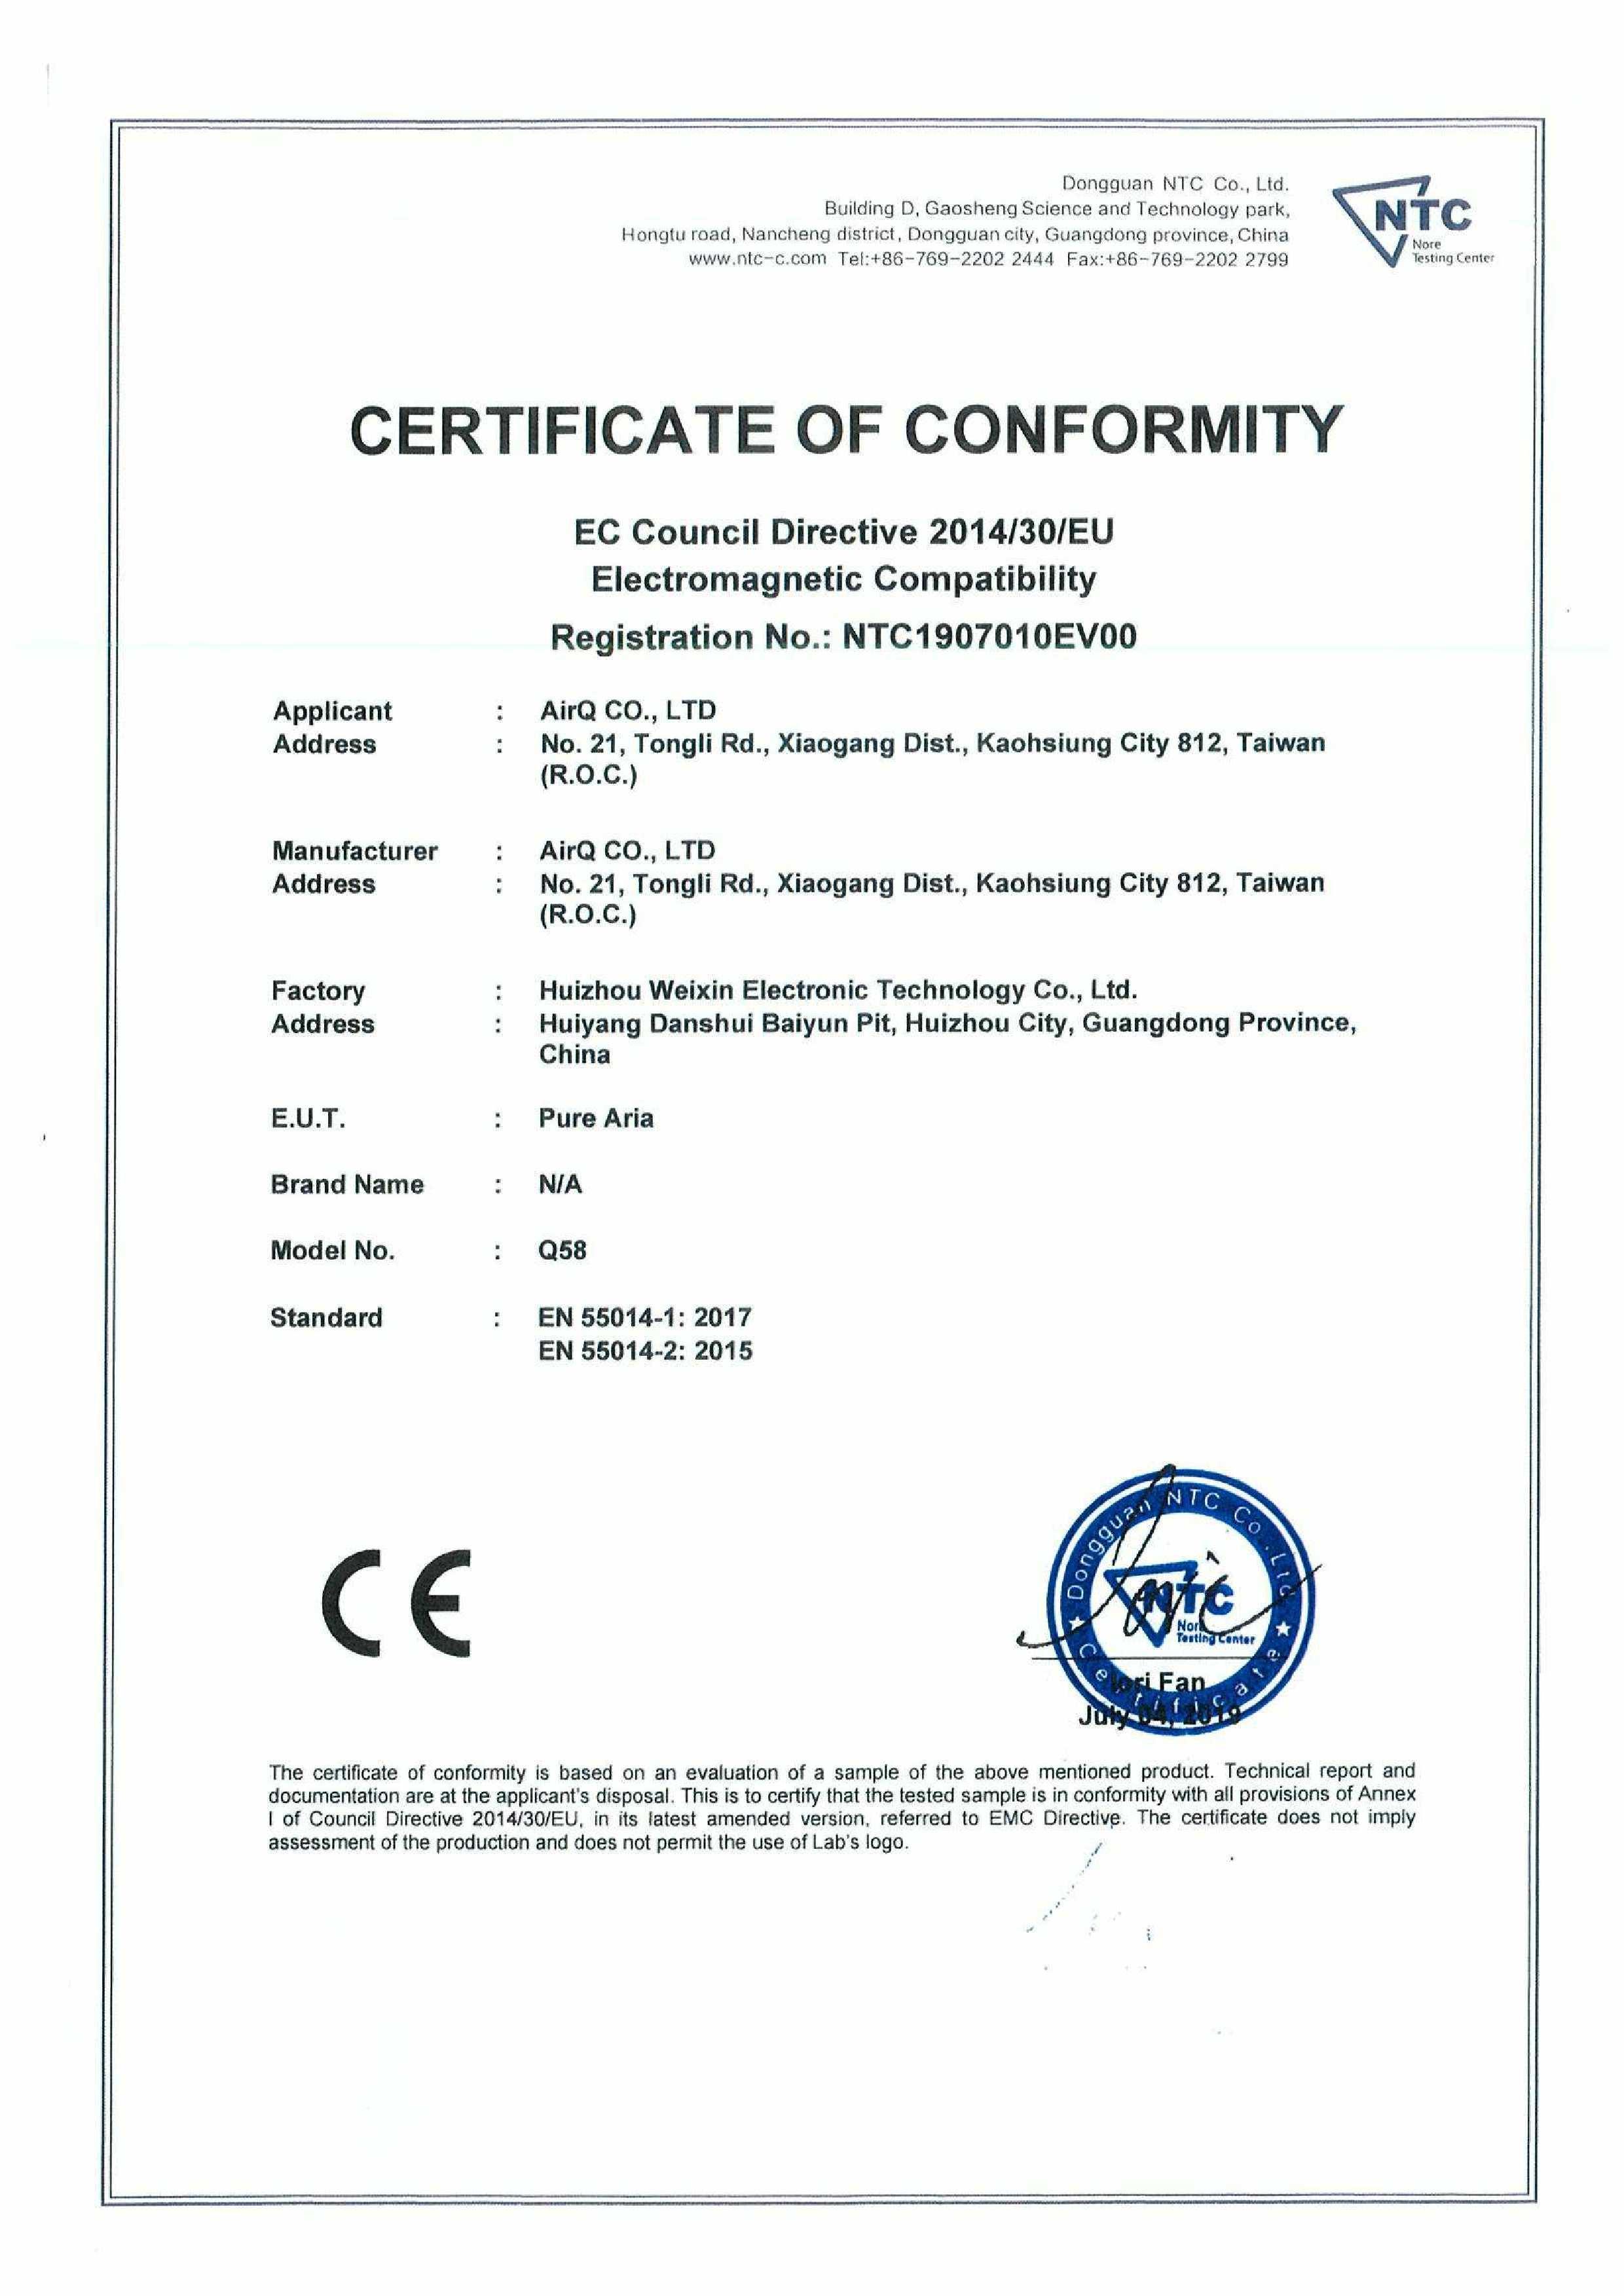 CE-歐盟電子認證